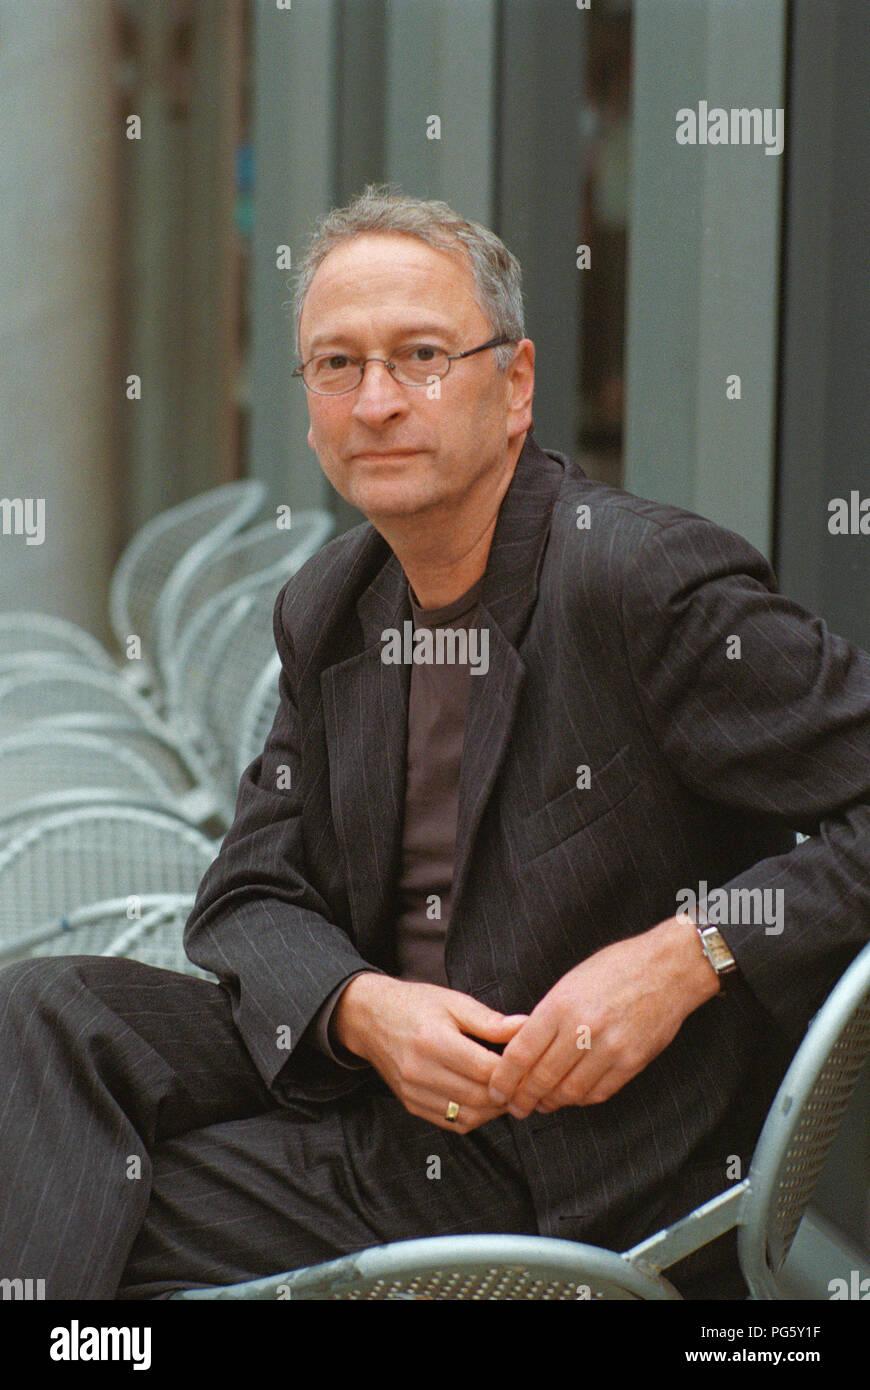 Thommie Bayer, German writer - 12.10.2011 - Stock Image